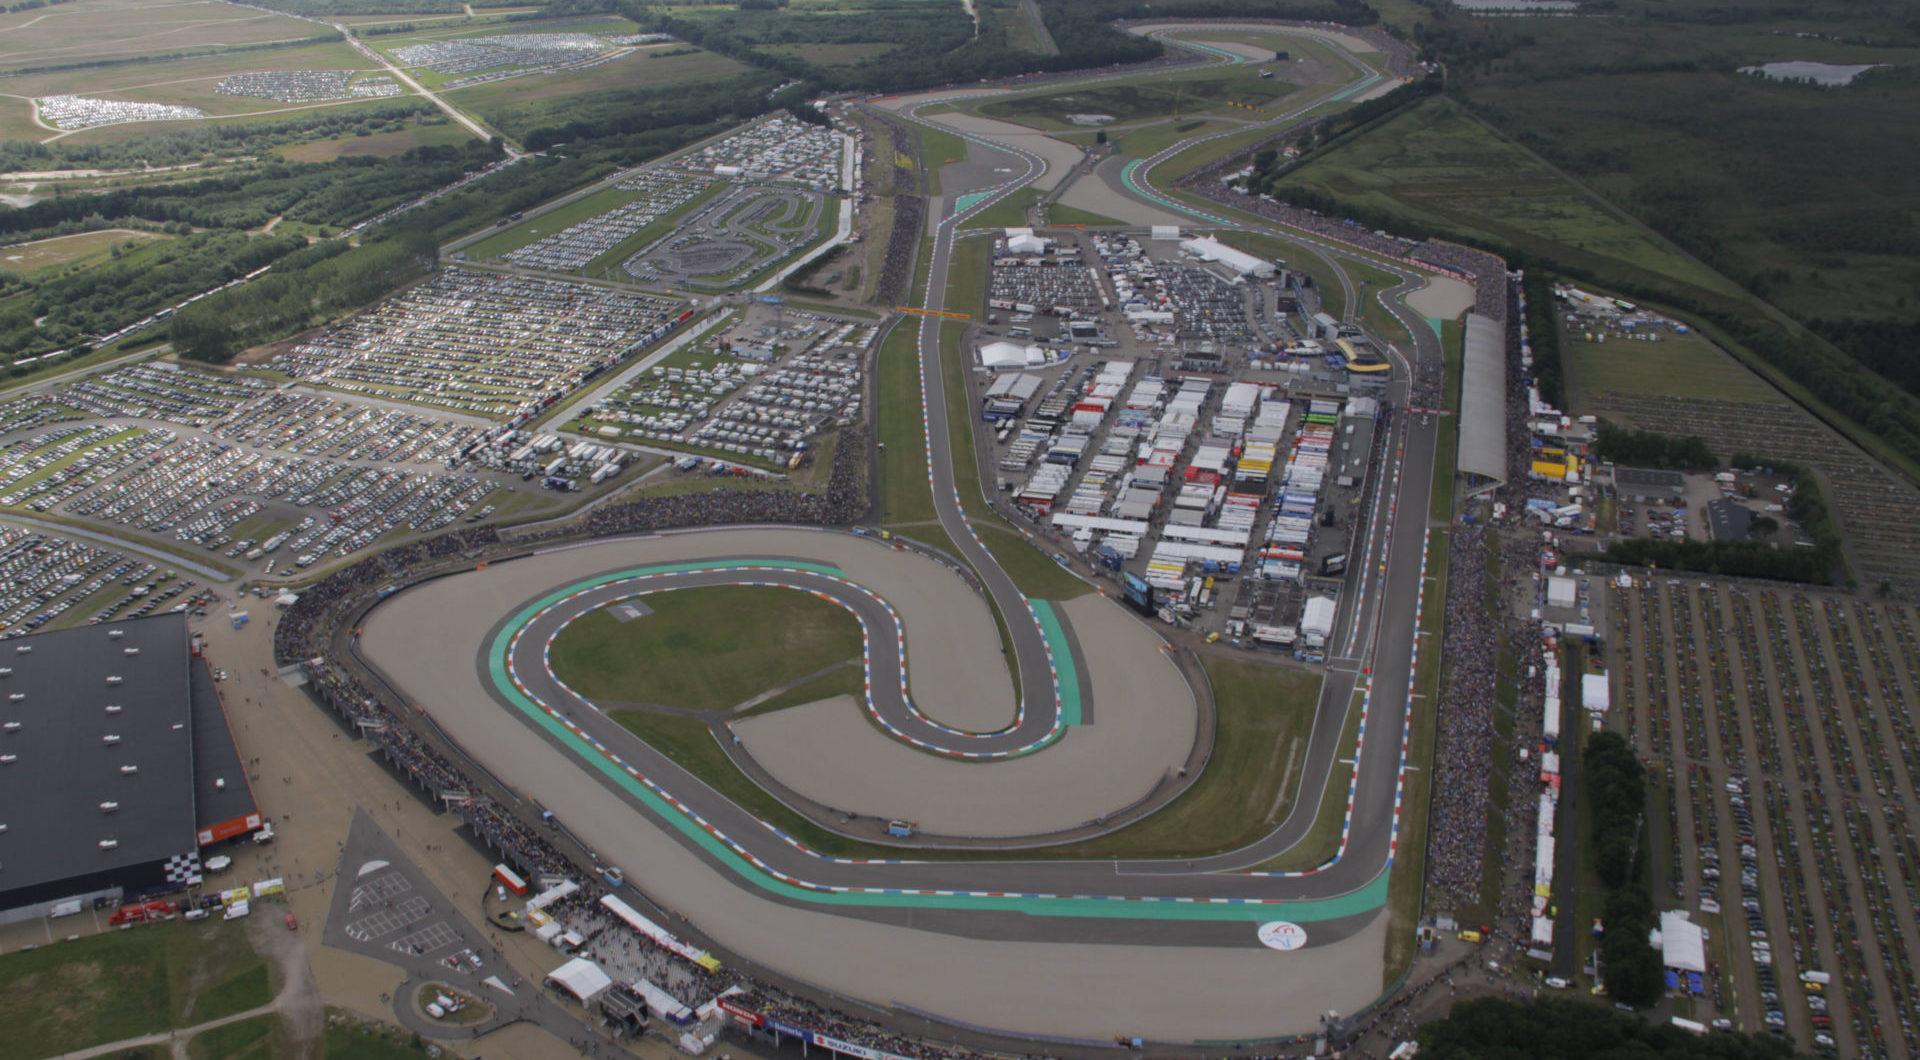 TT Circuit Assen. Photo courtesy Michelin.